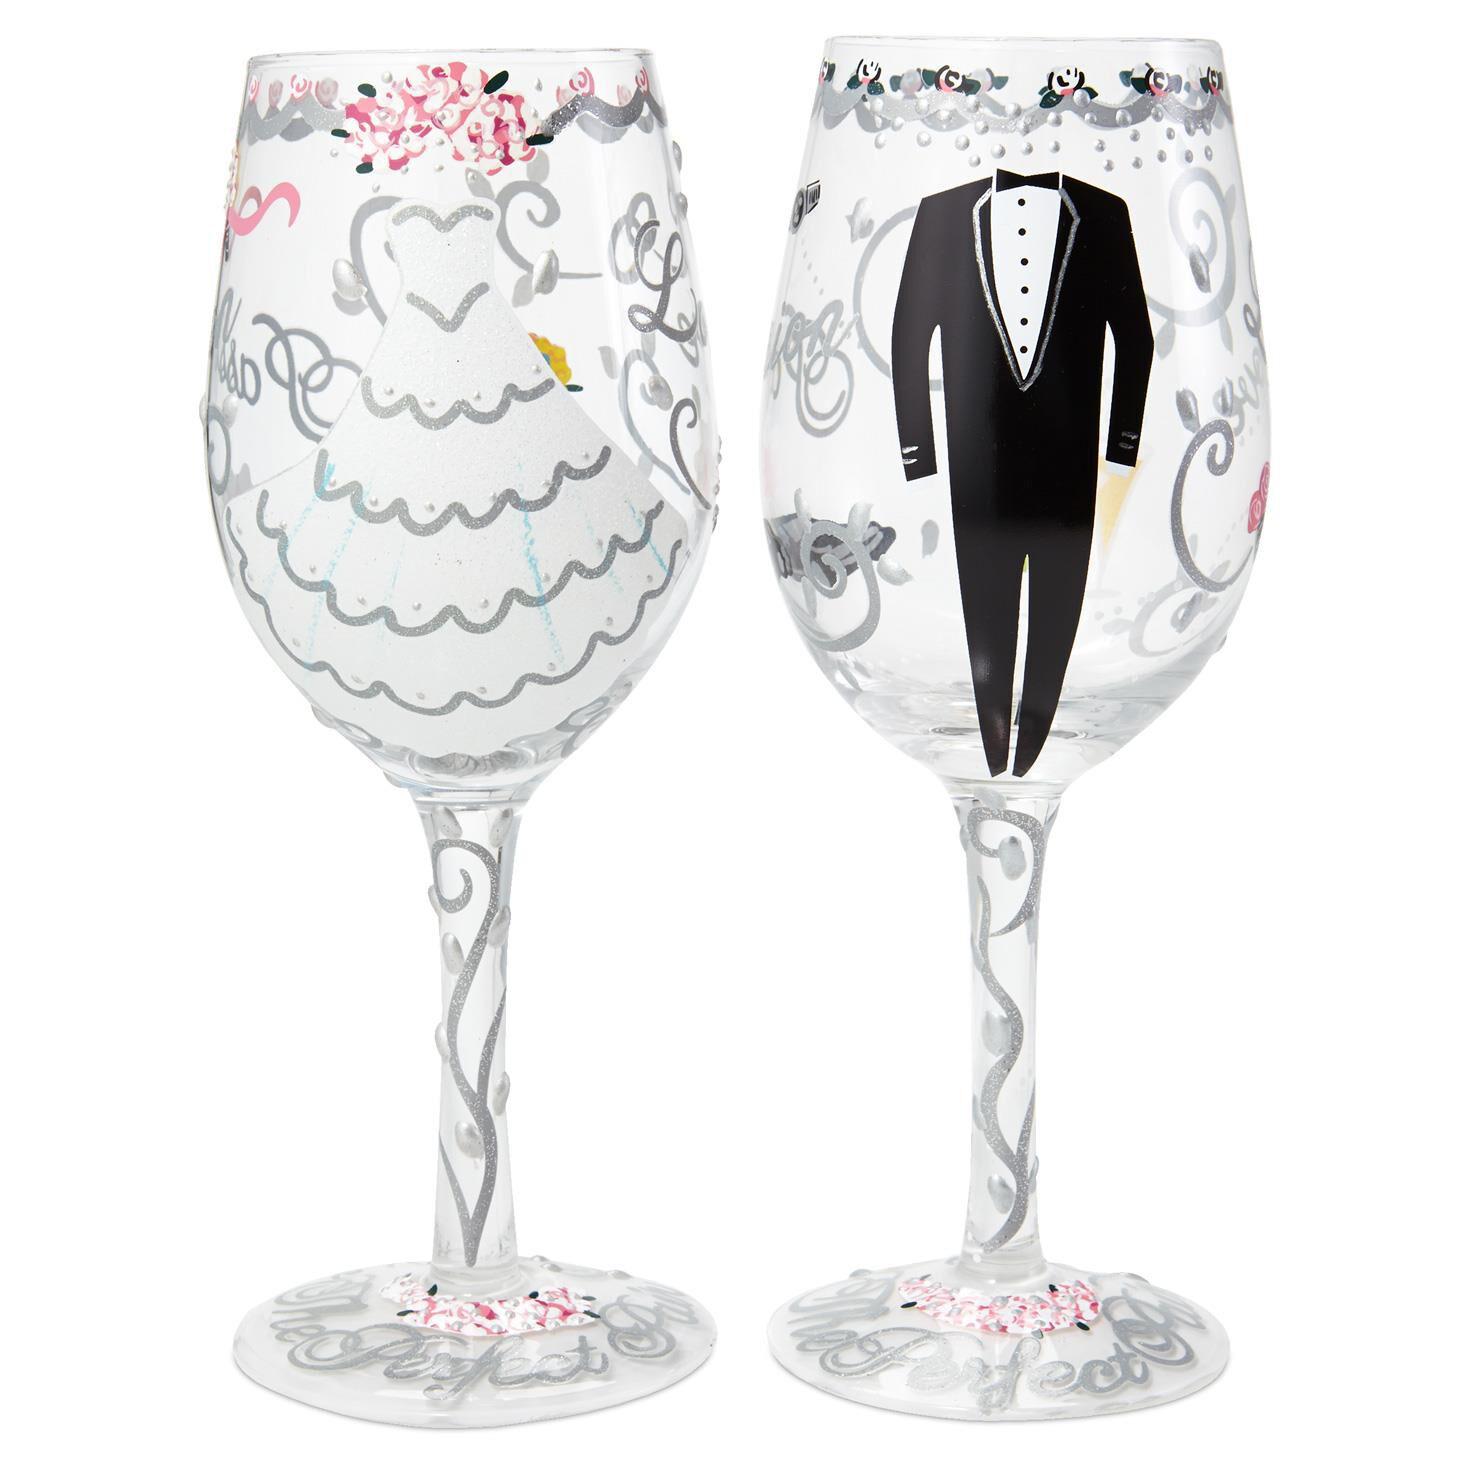 Lolita® Bride & Groom Handpainted Wine Glass Set, 15 oz. Each - Wine ...